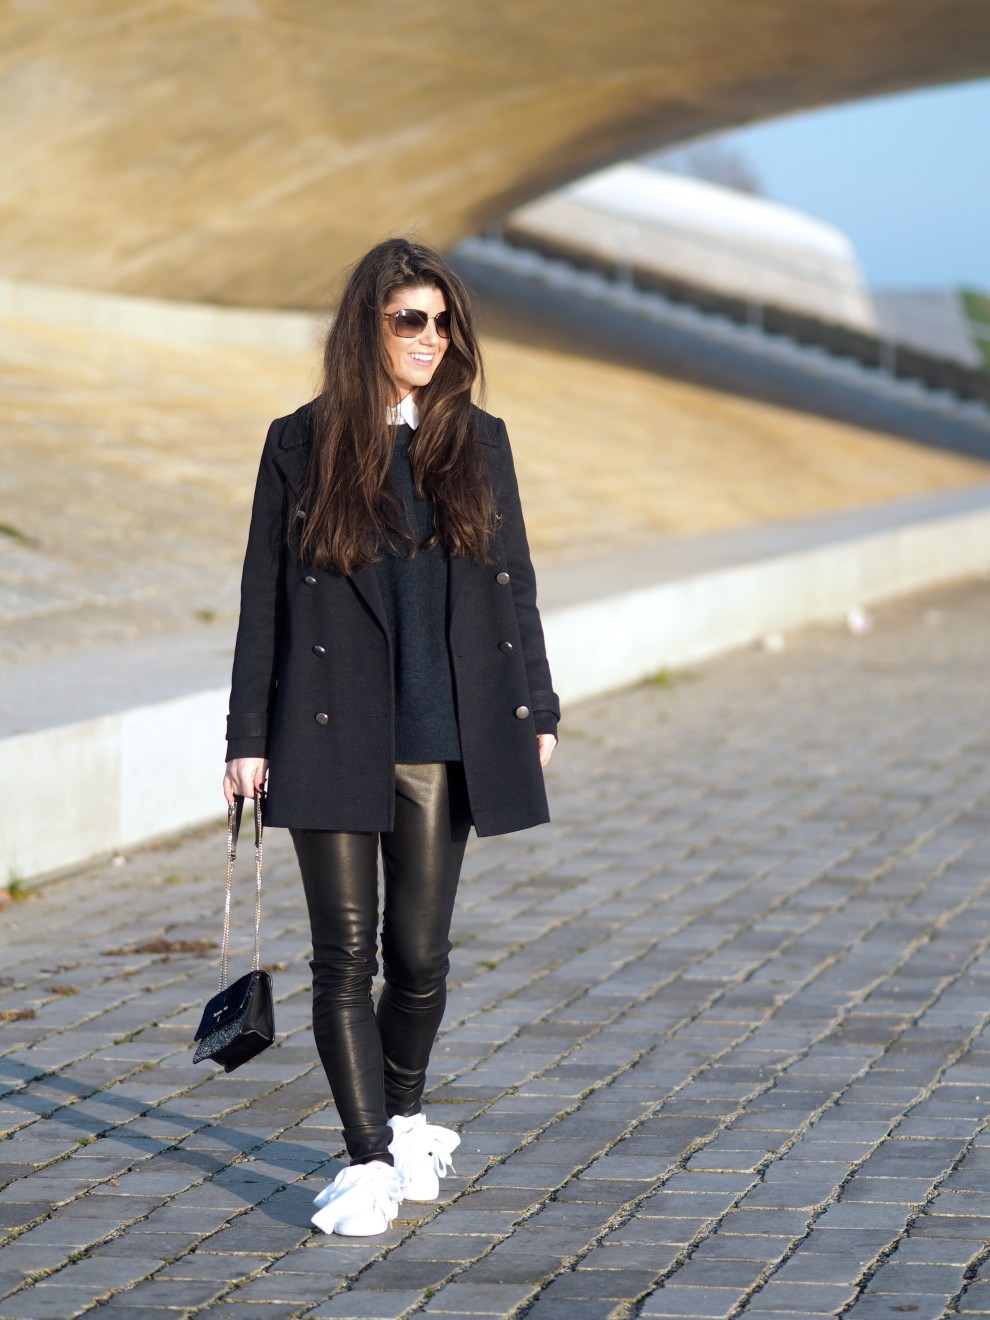 perfecte blauwe trui - samsoesamsoe fashionblog